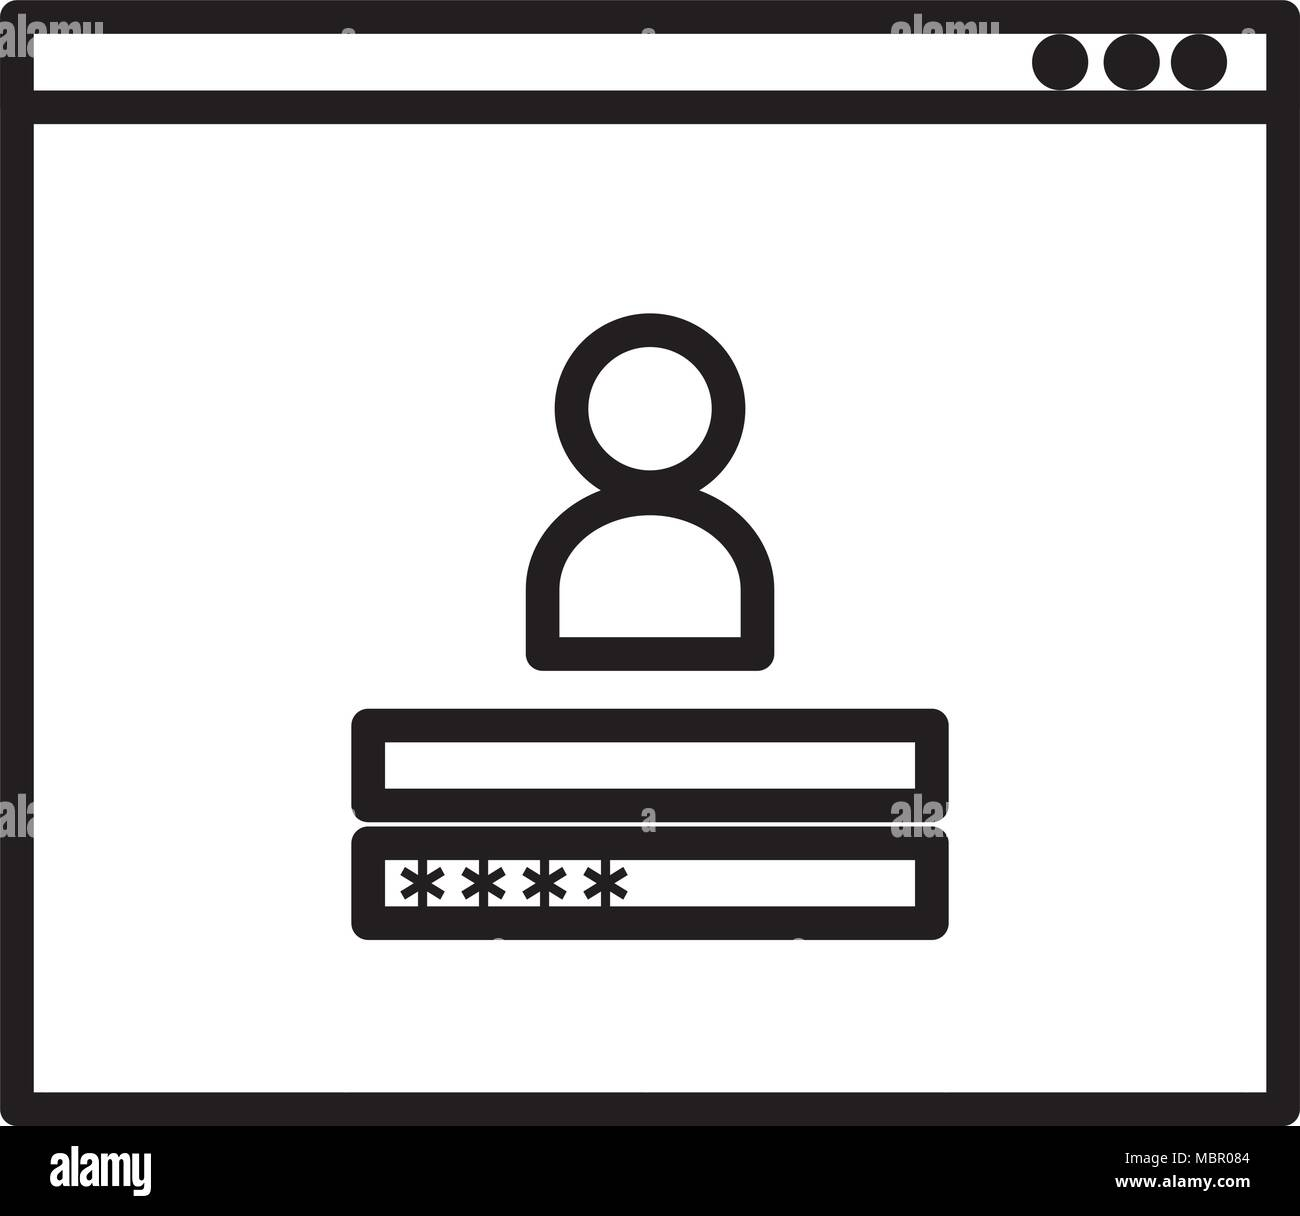 access template login icon Stock Vector Art & Illustration